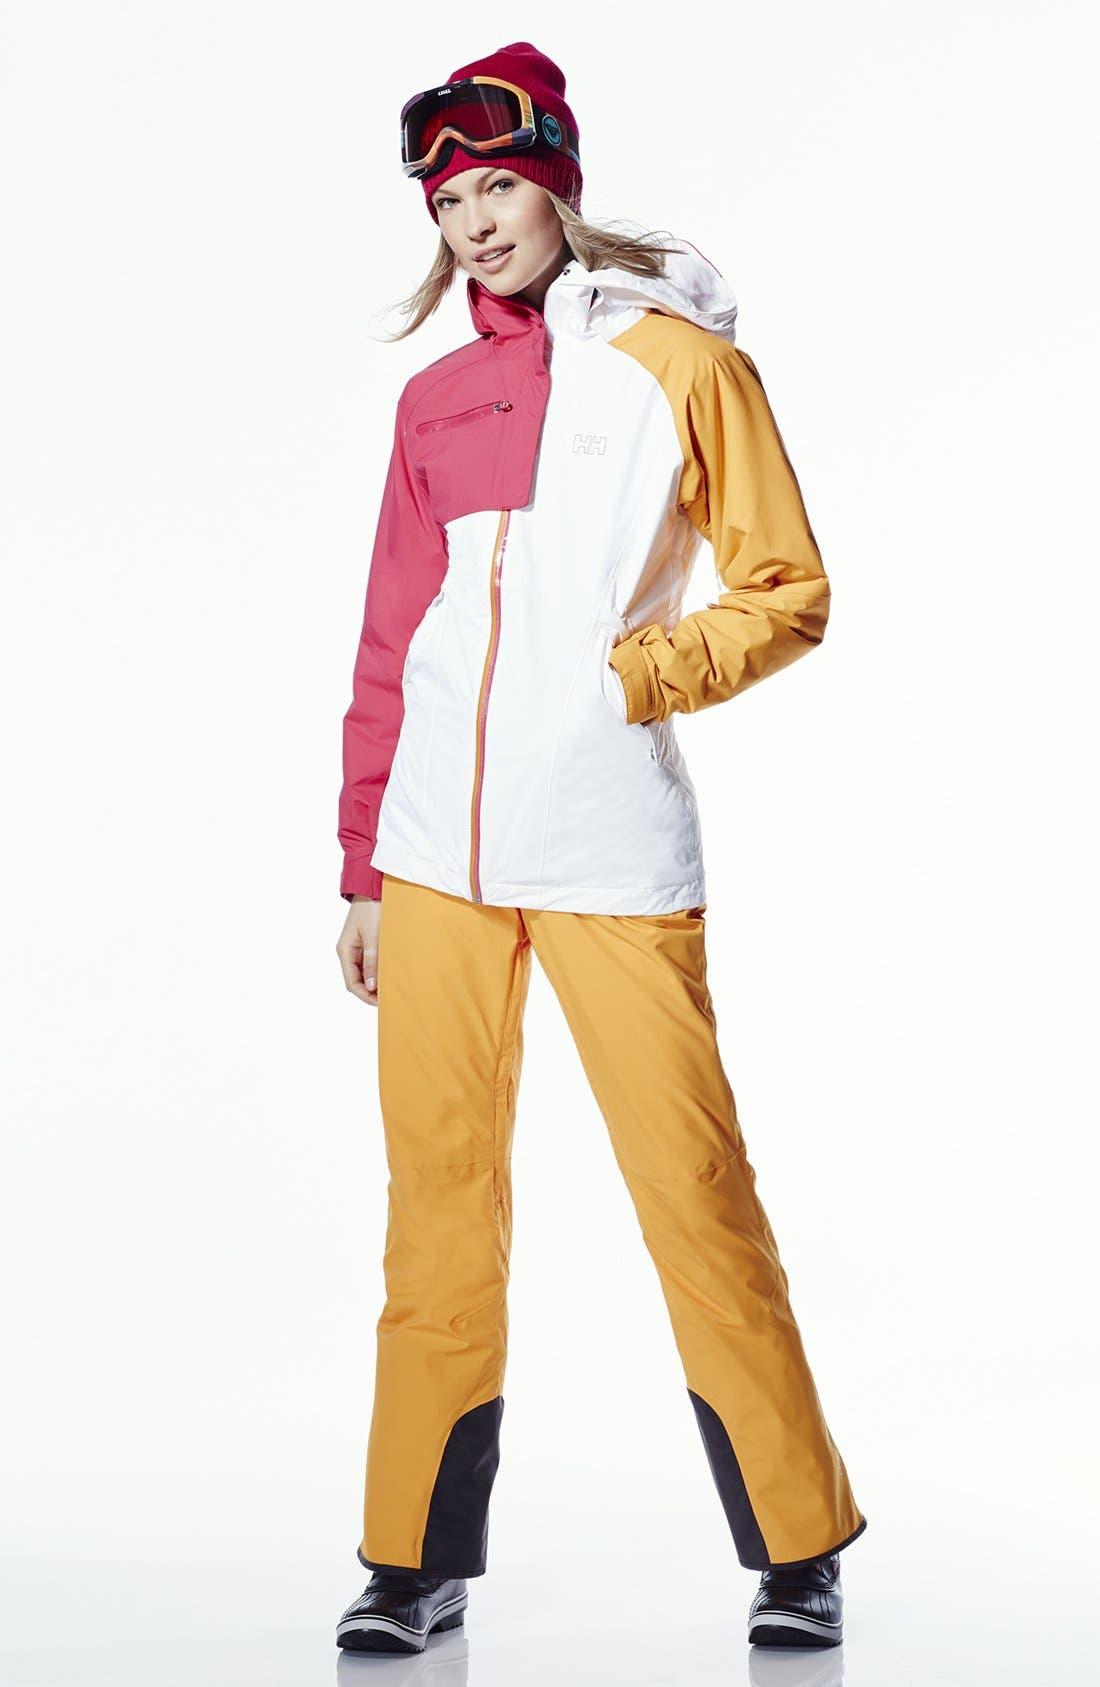 Alternate Image 1 Selected - Helly Hansen Ski Jacket & Pants